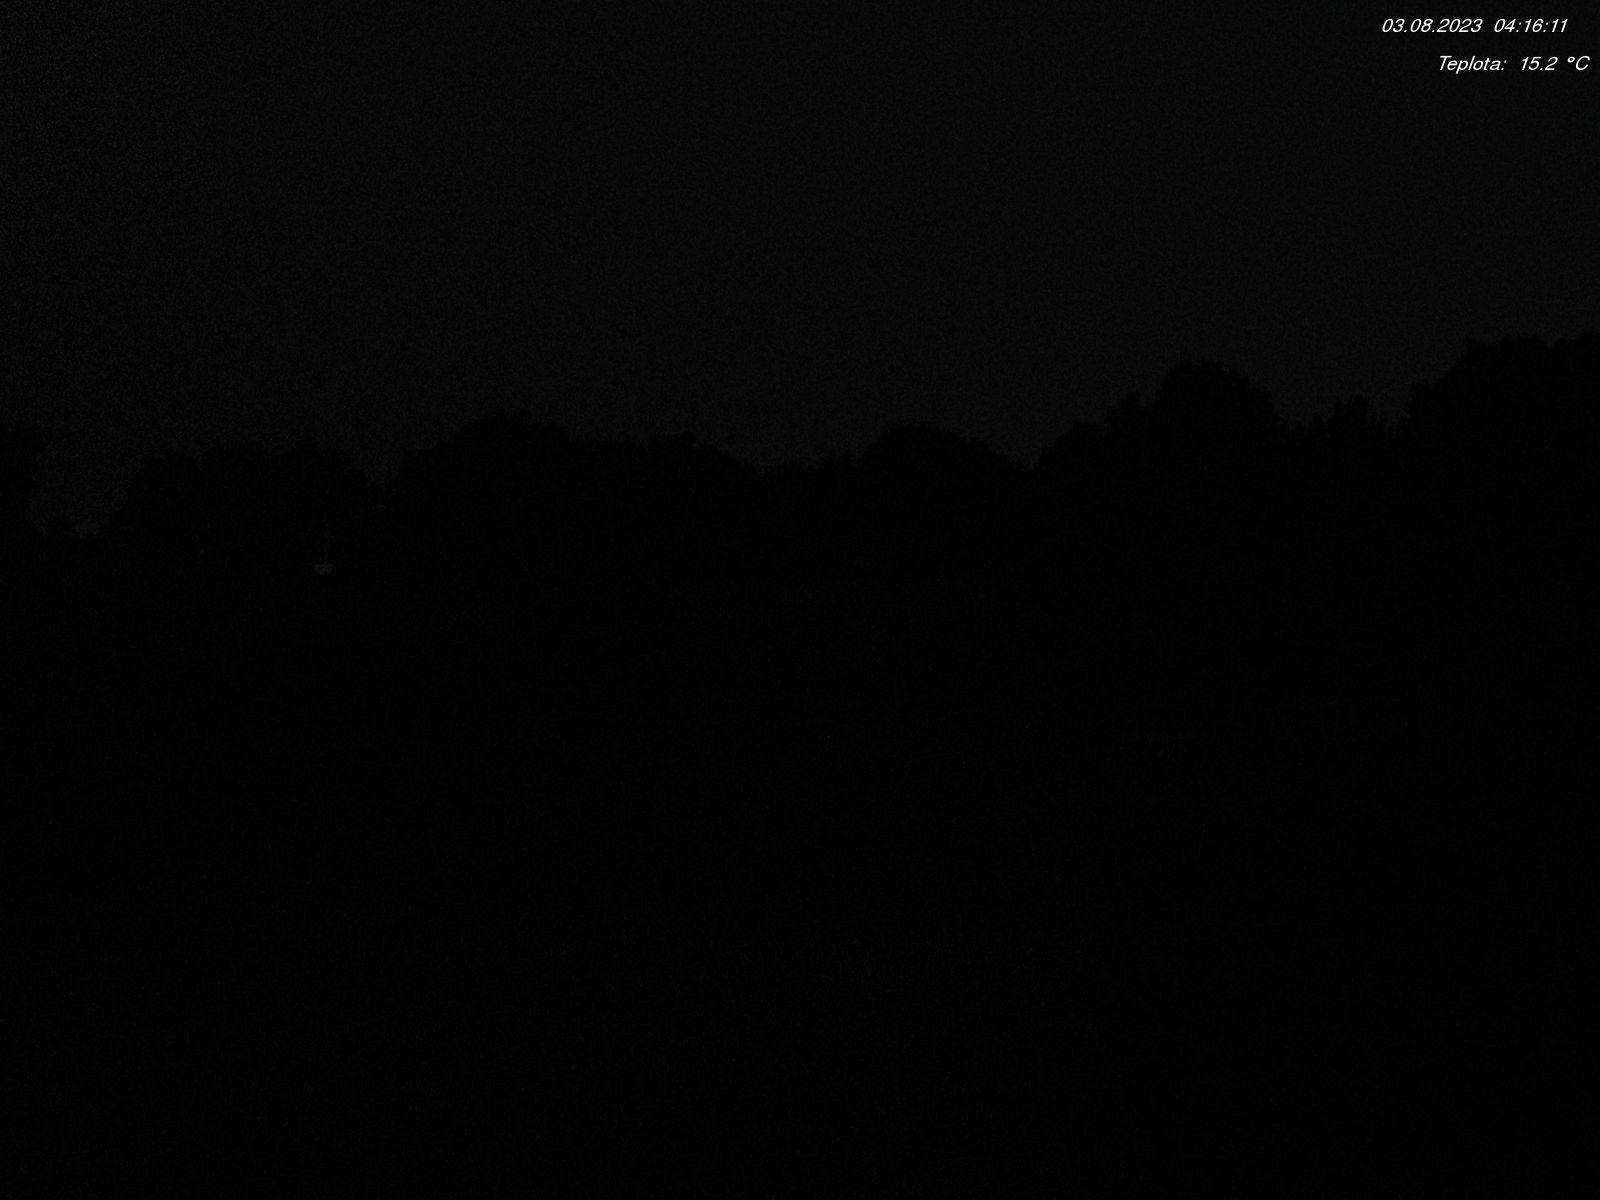 webkamera Alenina Lhota, Jihočeský kraj